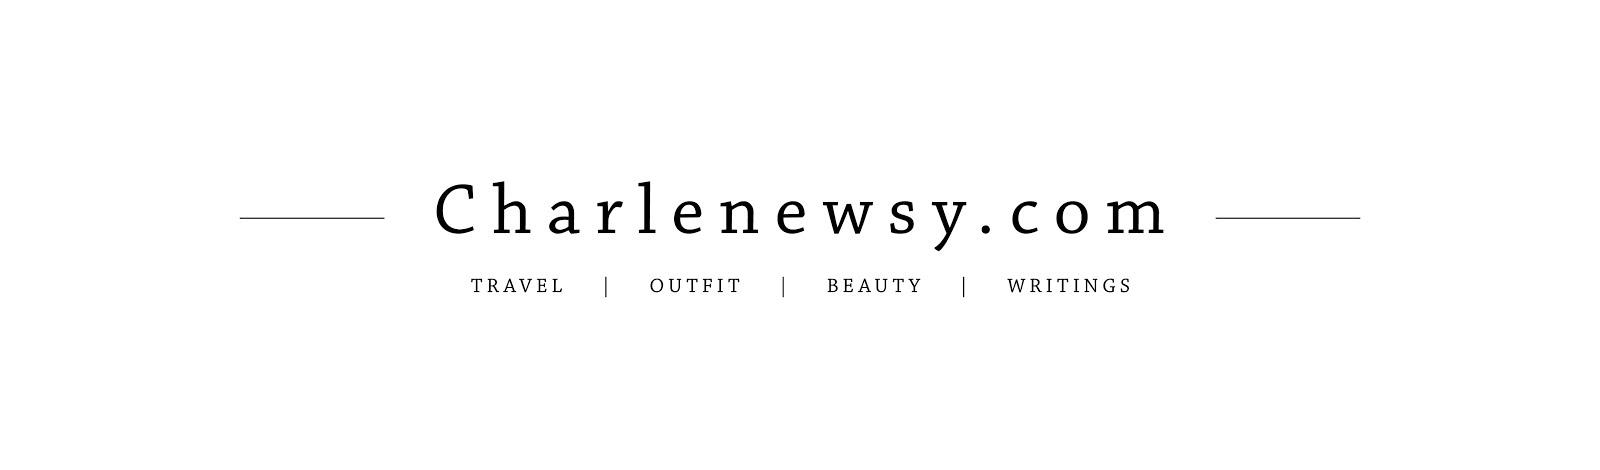 Charlenewsy.com